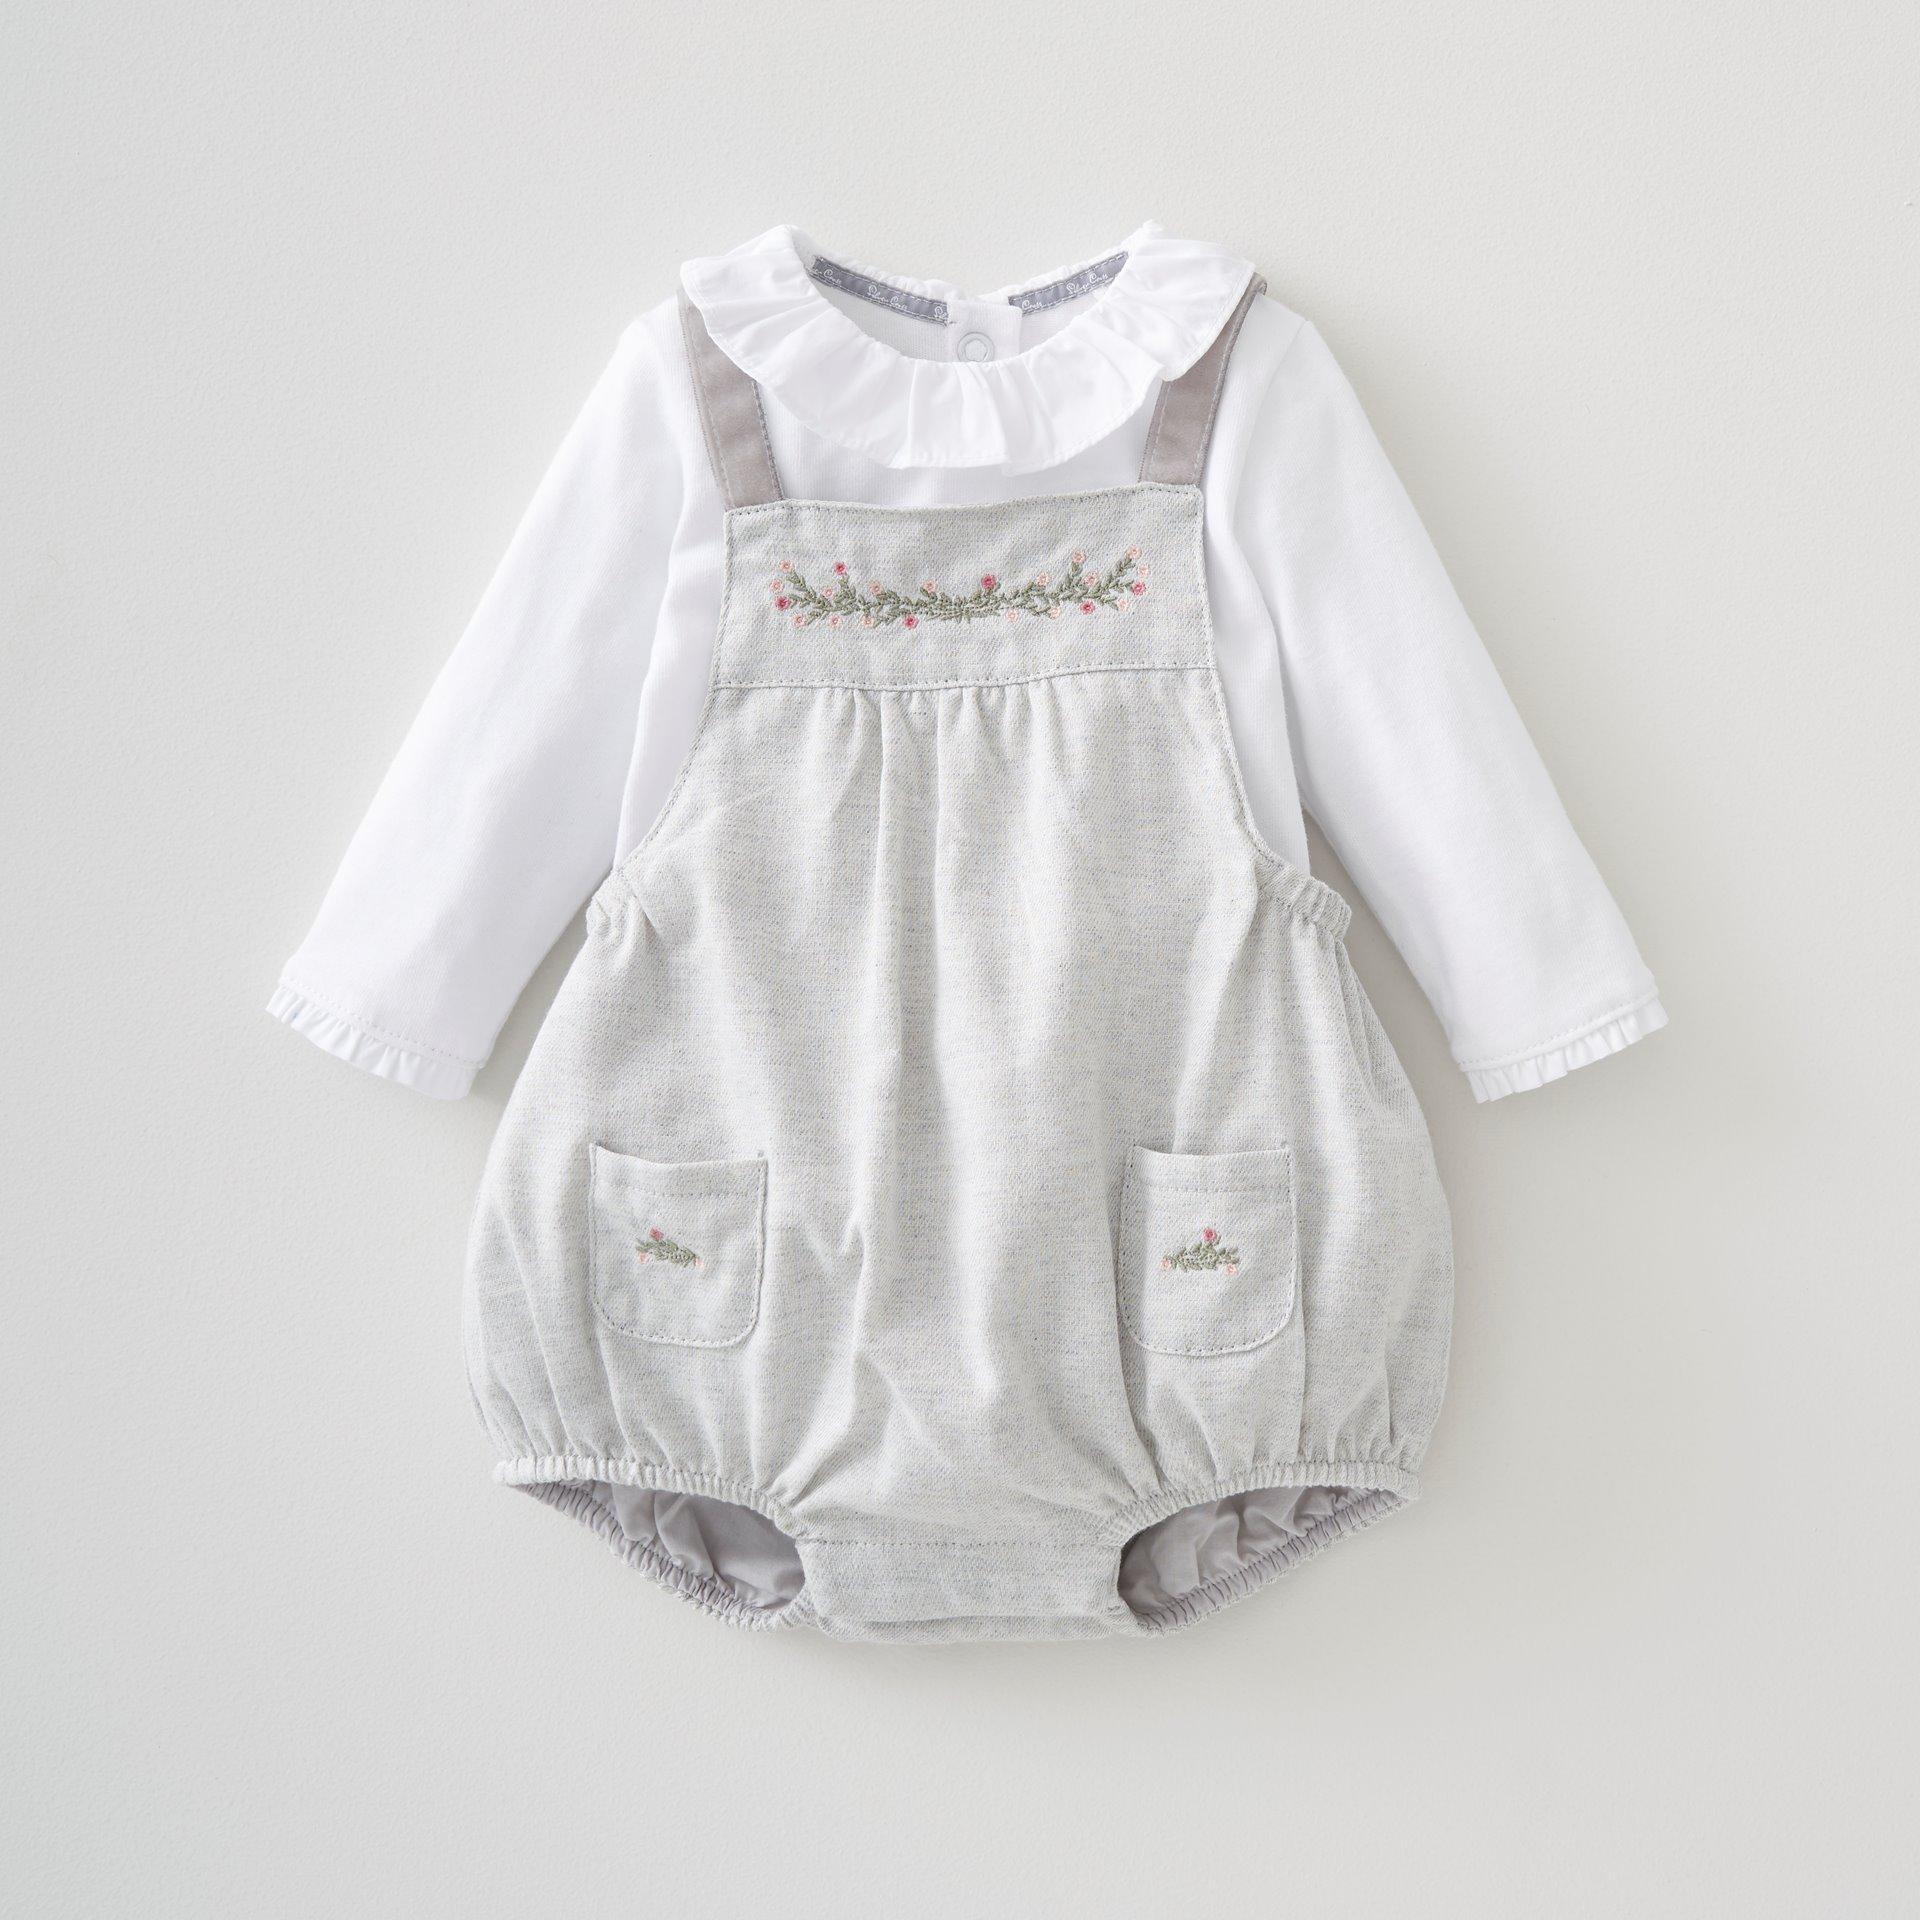 Girls 2 Pce Bloomer & Bodysuit Set 0-3 Months